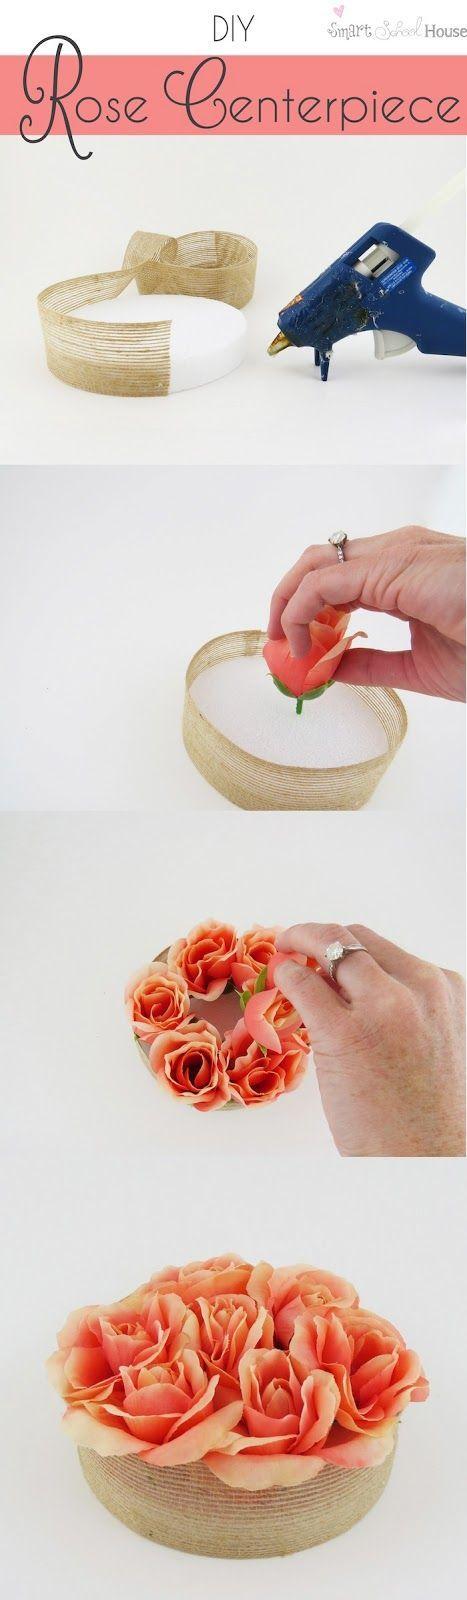 Como hacer centros de mesa para boda                                                                                                                                                                                 Más